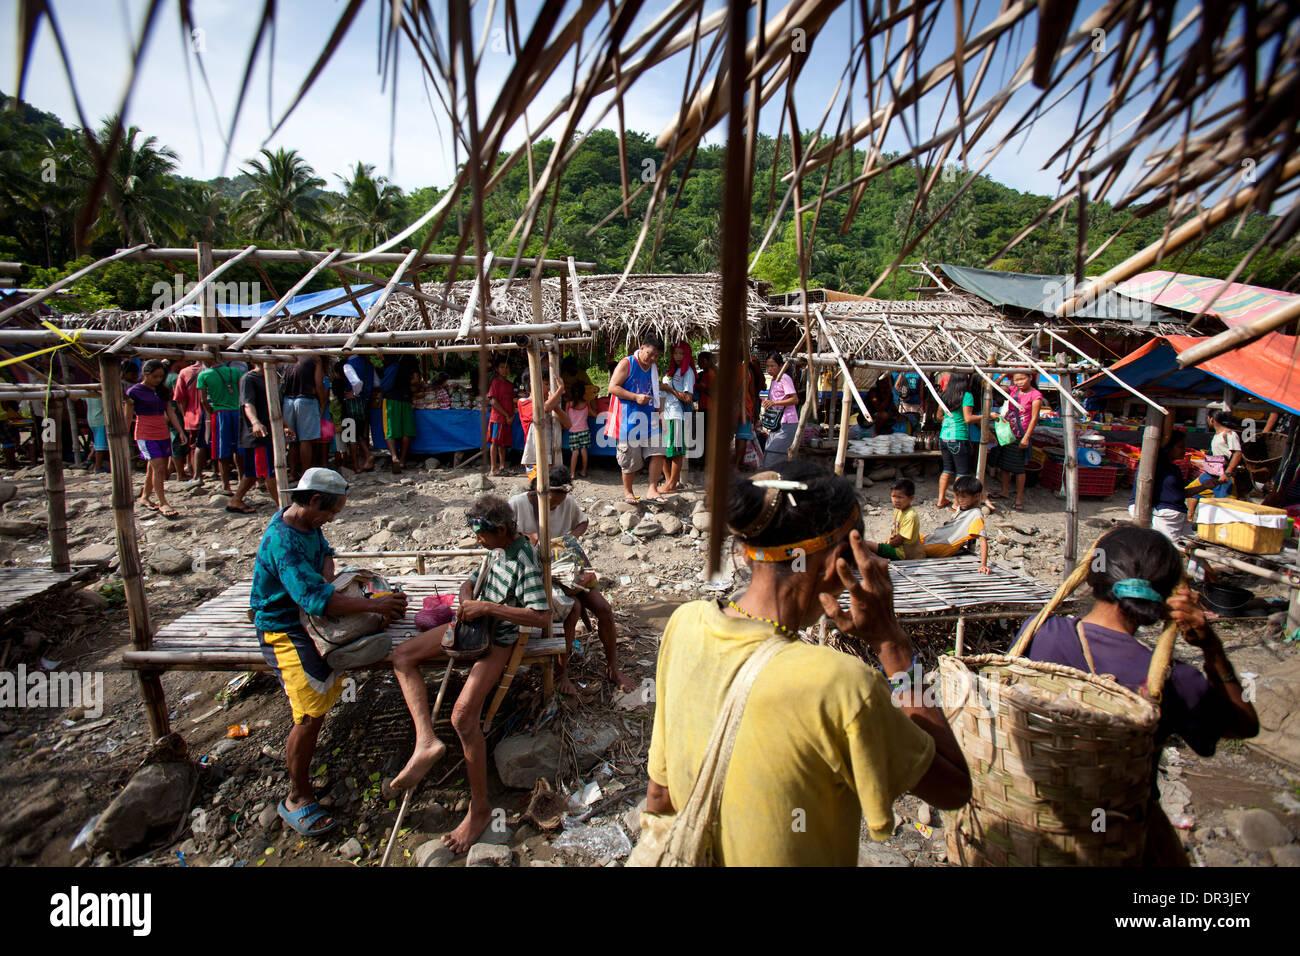 Hanunoo Mangyans at a Mangyan market near Mansalay, Oriental Mindoro, Philippines. - Stock Image